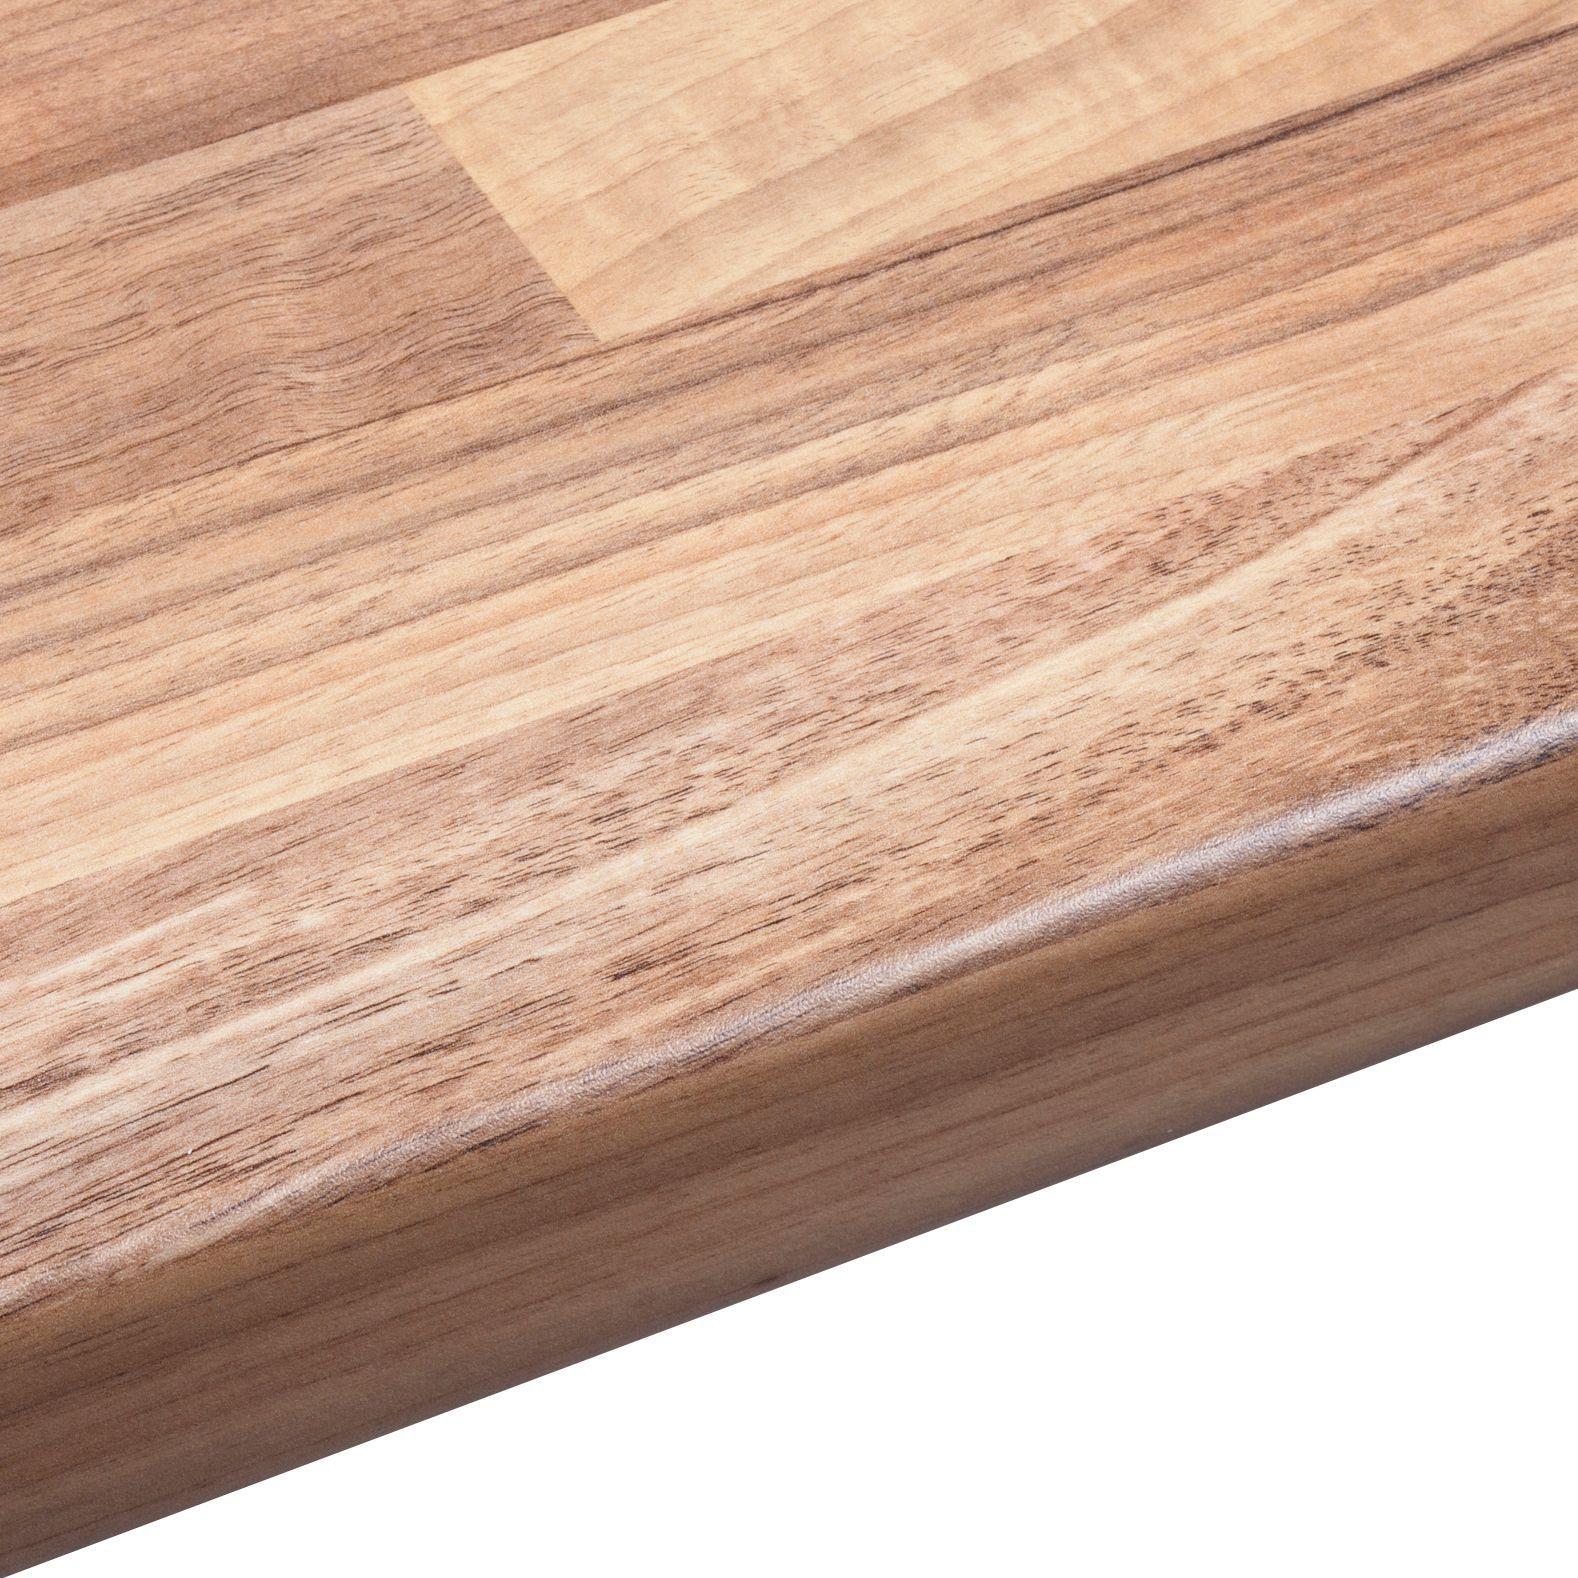 Laminate Wood Kitchen Worktops: DIY At B&Q